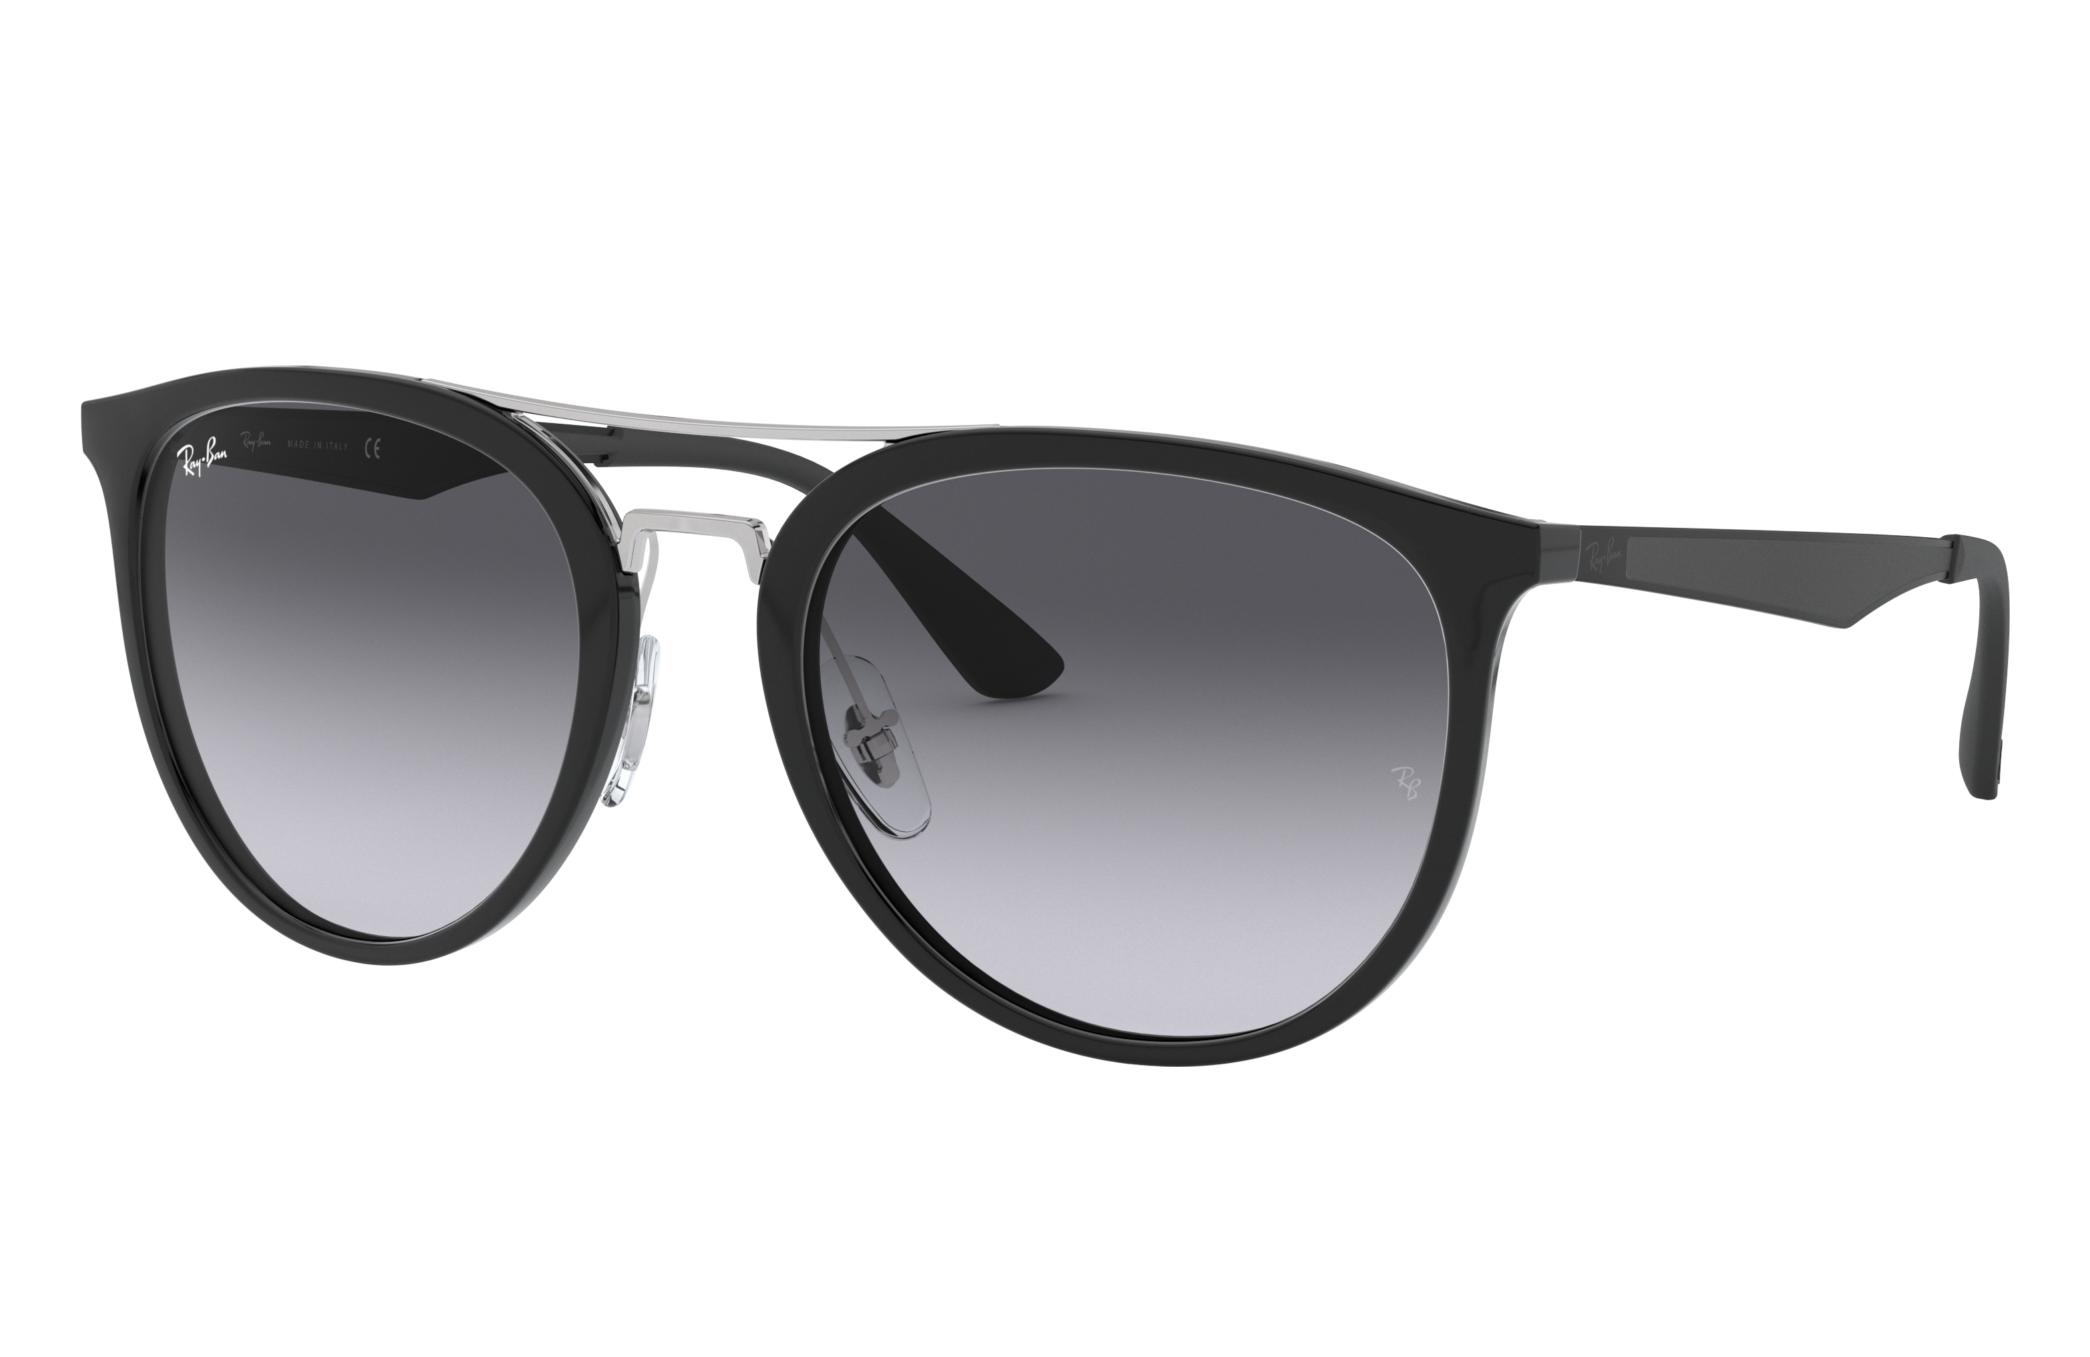 Ray-Ban Rb4285 Black, Gray Lenses - RB4285